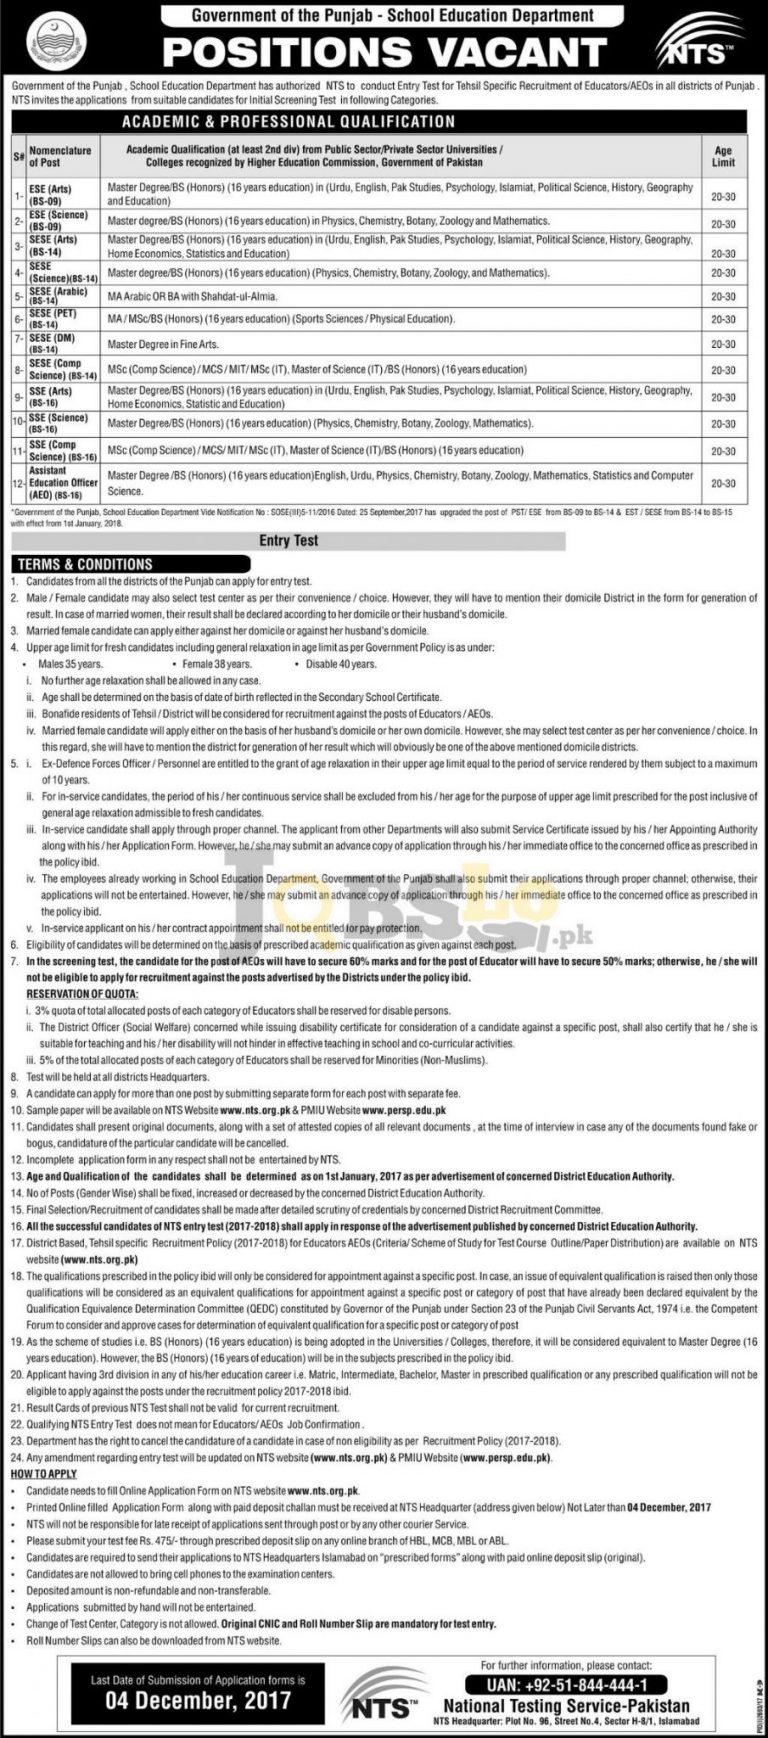 50000 Educators Jobs 2017-18 in Government of Punjab – School Education Department